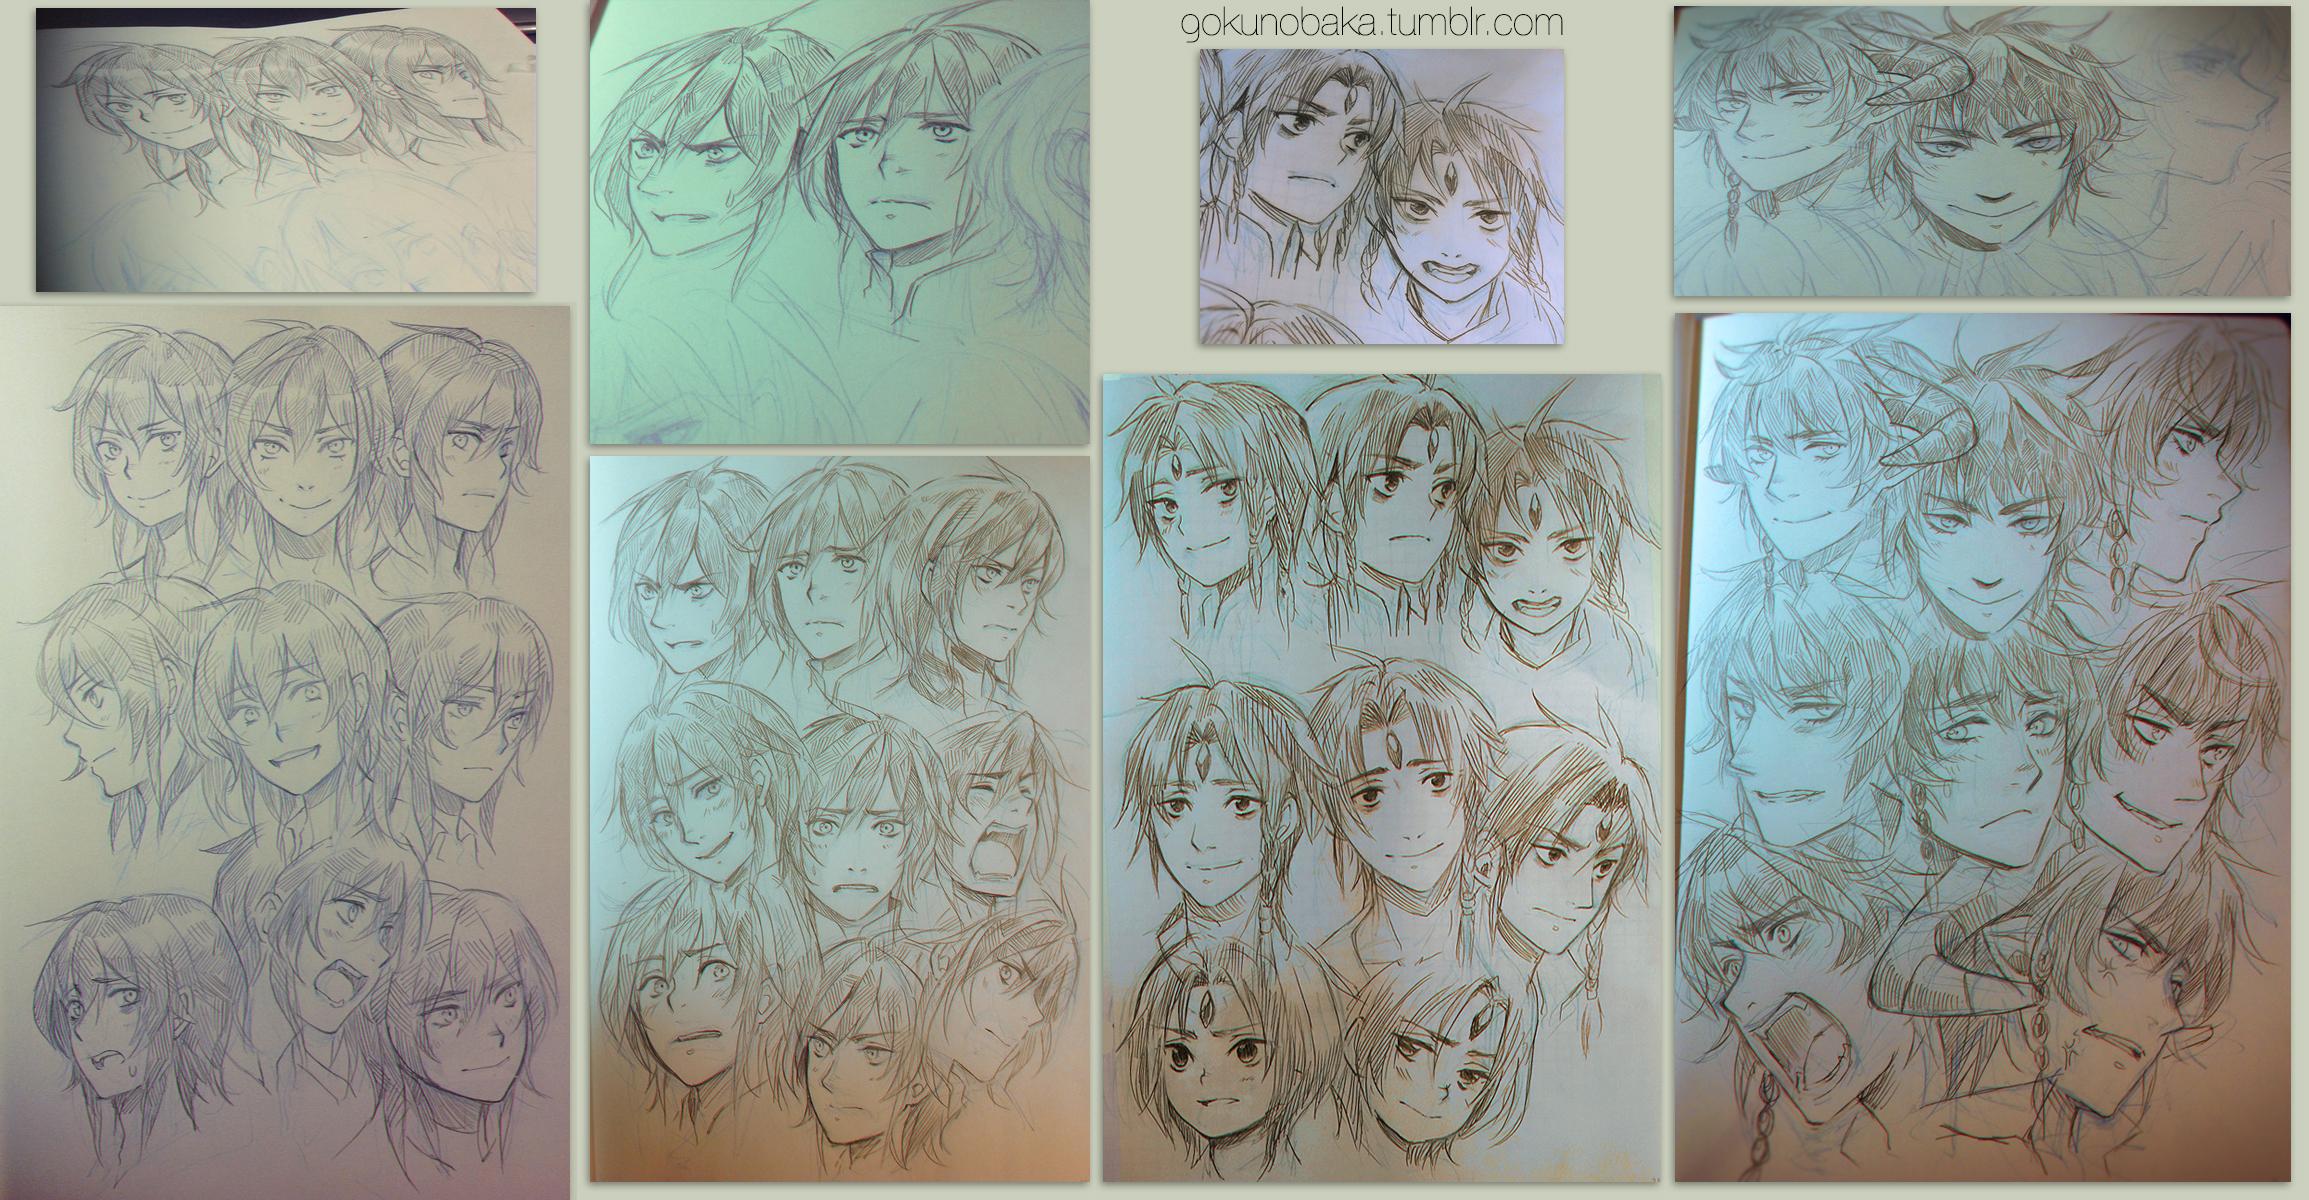 +Tumblr Face angle Sketch Practice+ by goku-no-baka